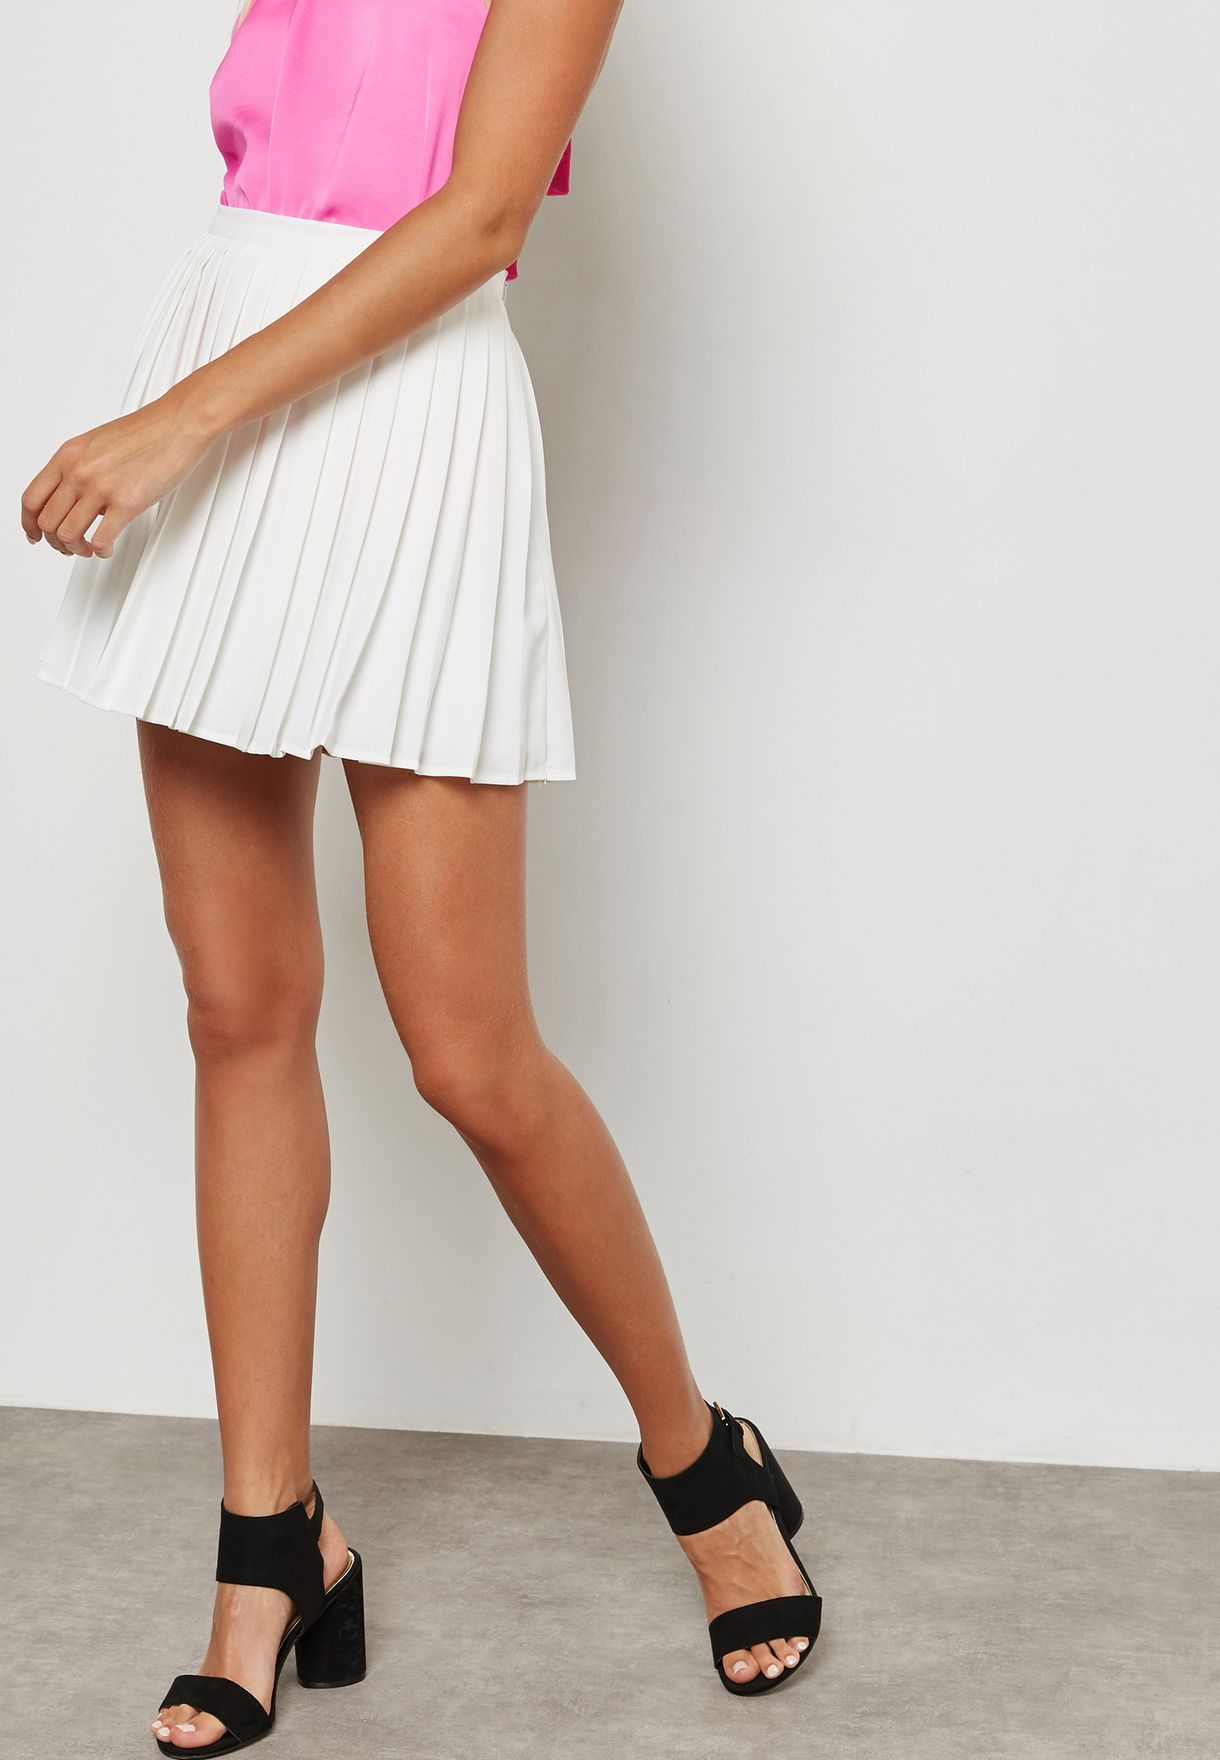 COSYOU Big Girls Students Sports Skirt Pleated Short Mini Skirt Uniforms